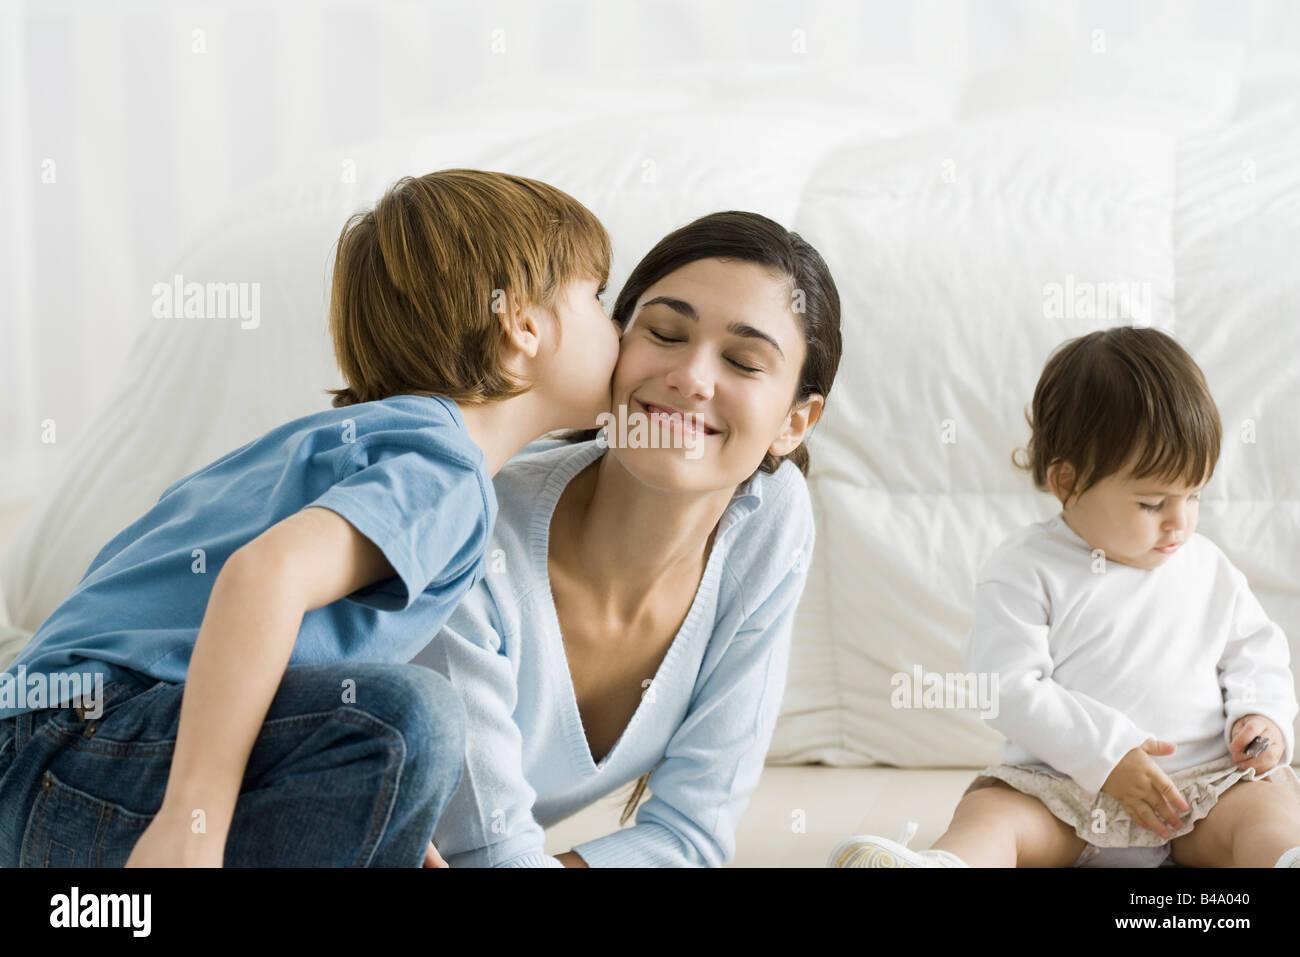 Children girls boy cheek kiss stock photos children girls boy little boy kissing mothers cheek toddler girl sitting nearby stock image thecheapjerseys Images